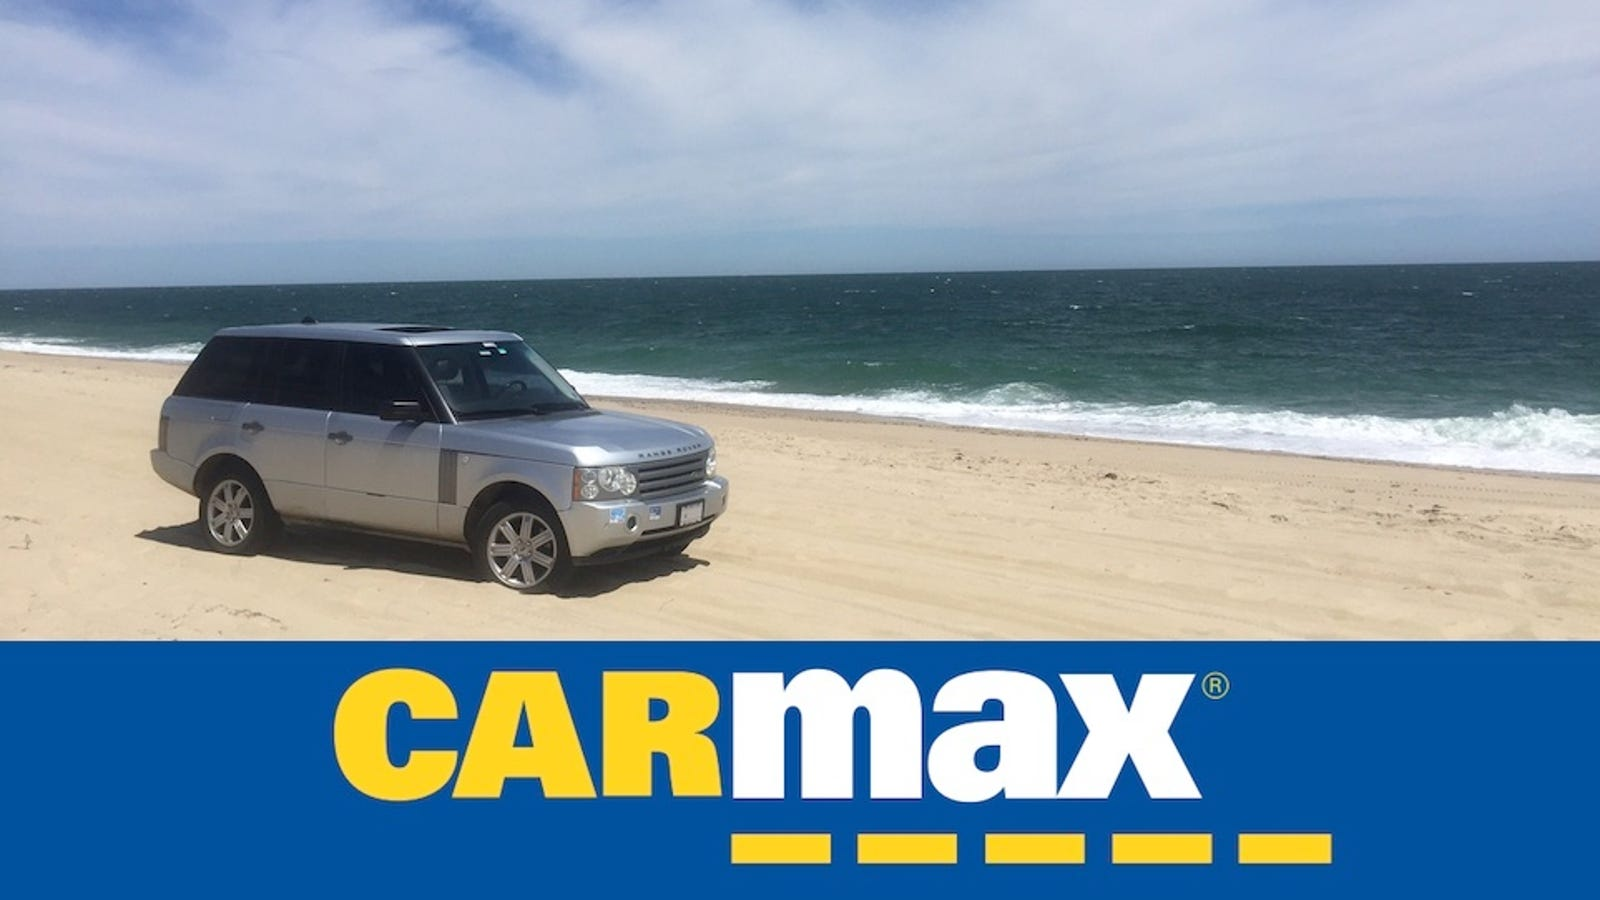 Carmax Car Buying Center Reviews